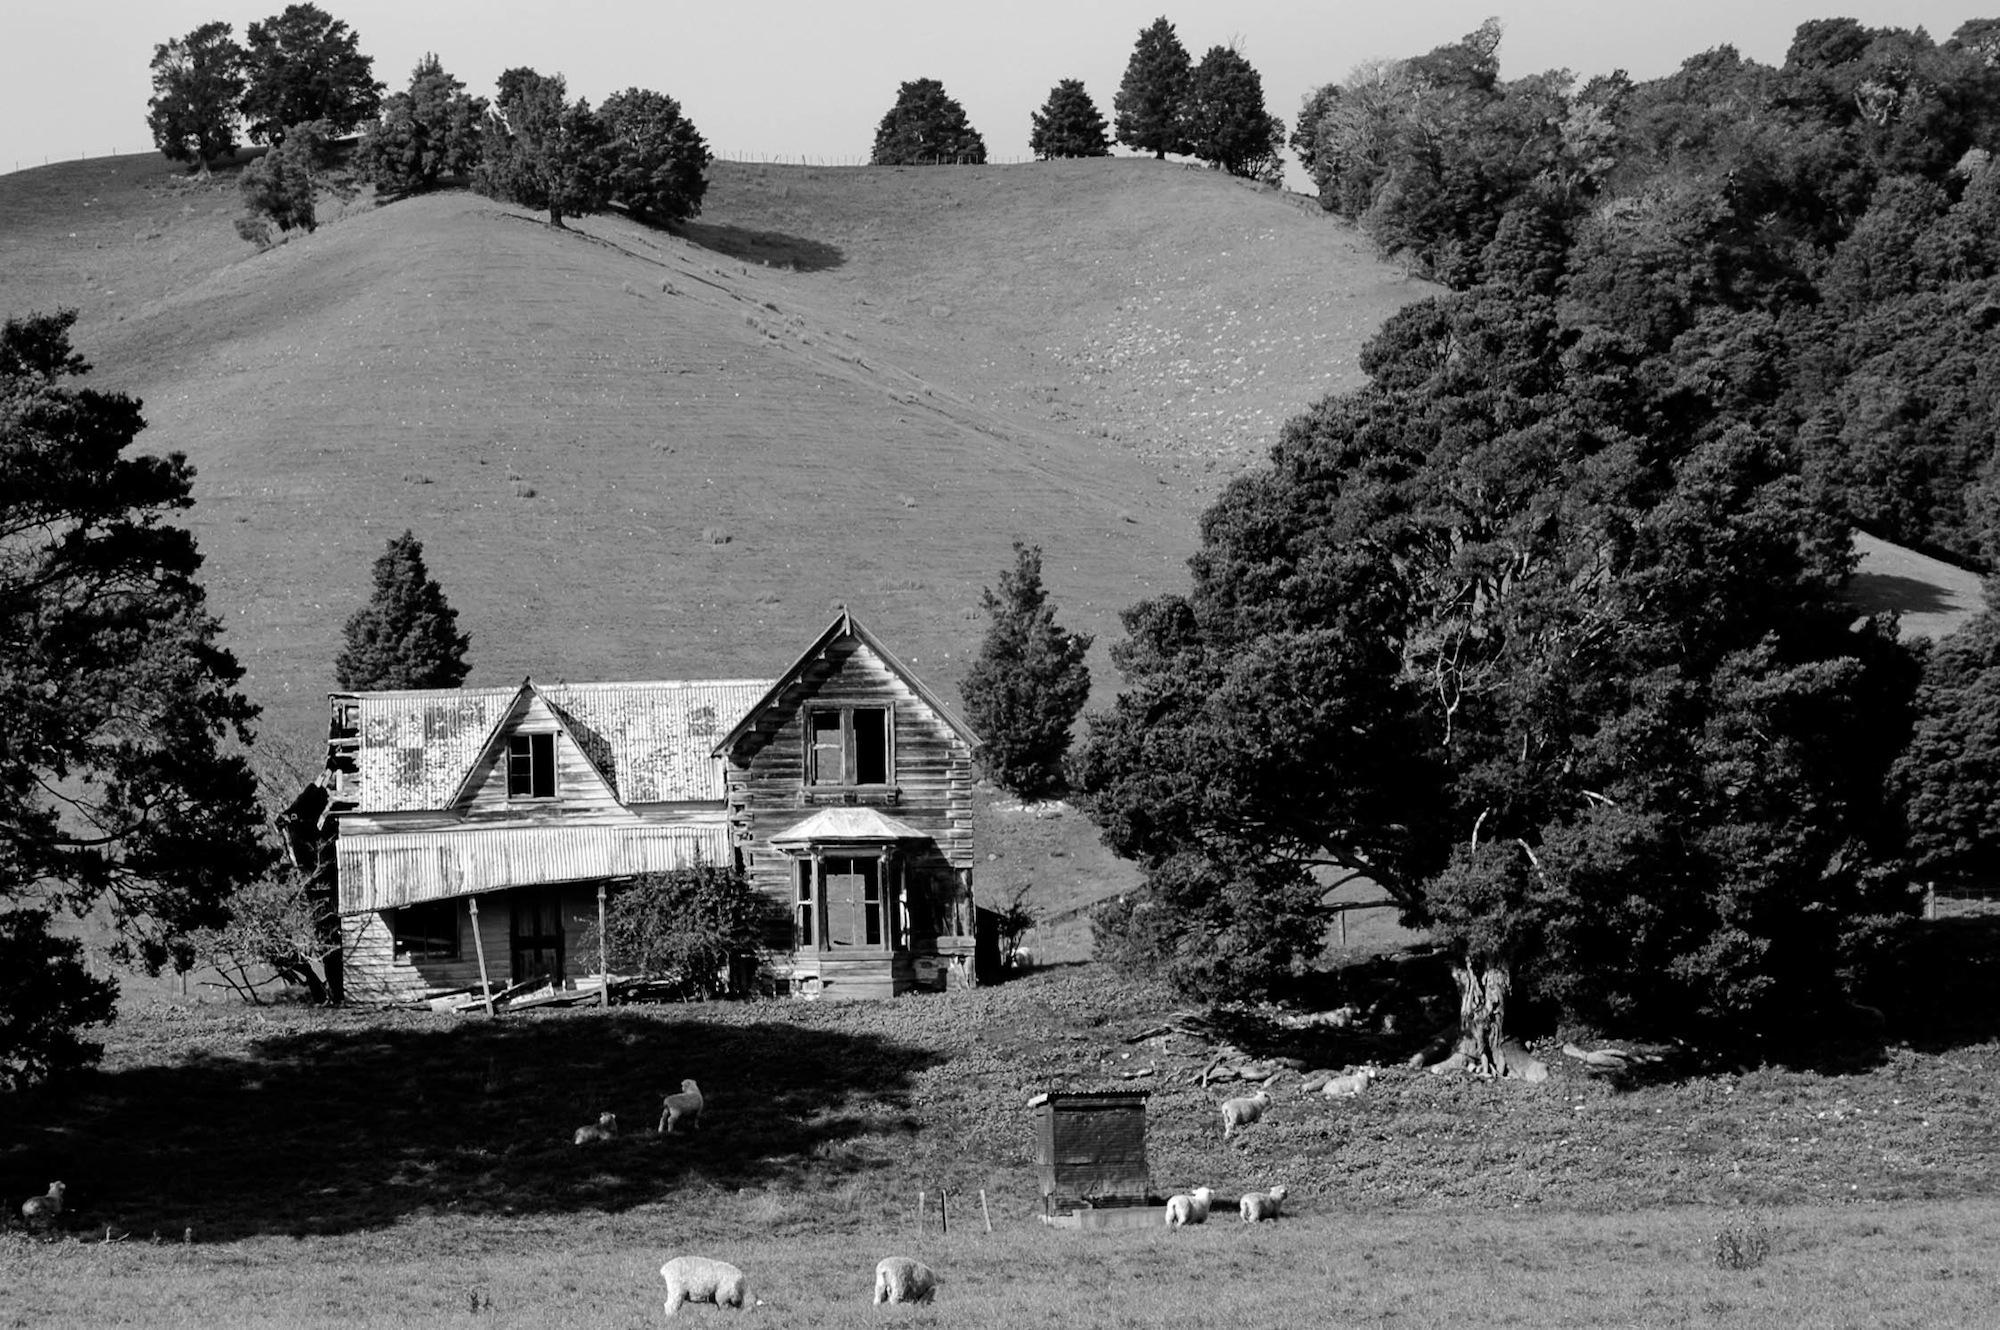 abandoned_house_new zealand_ben_howe_2.jpg